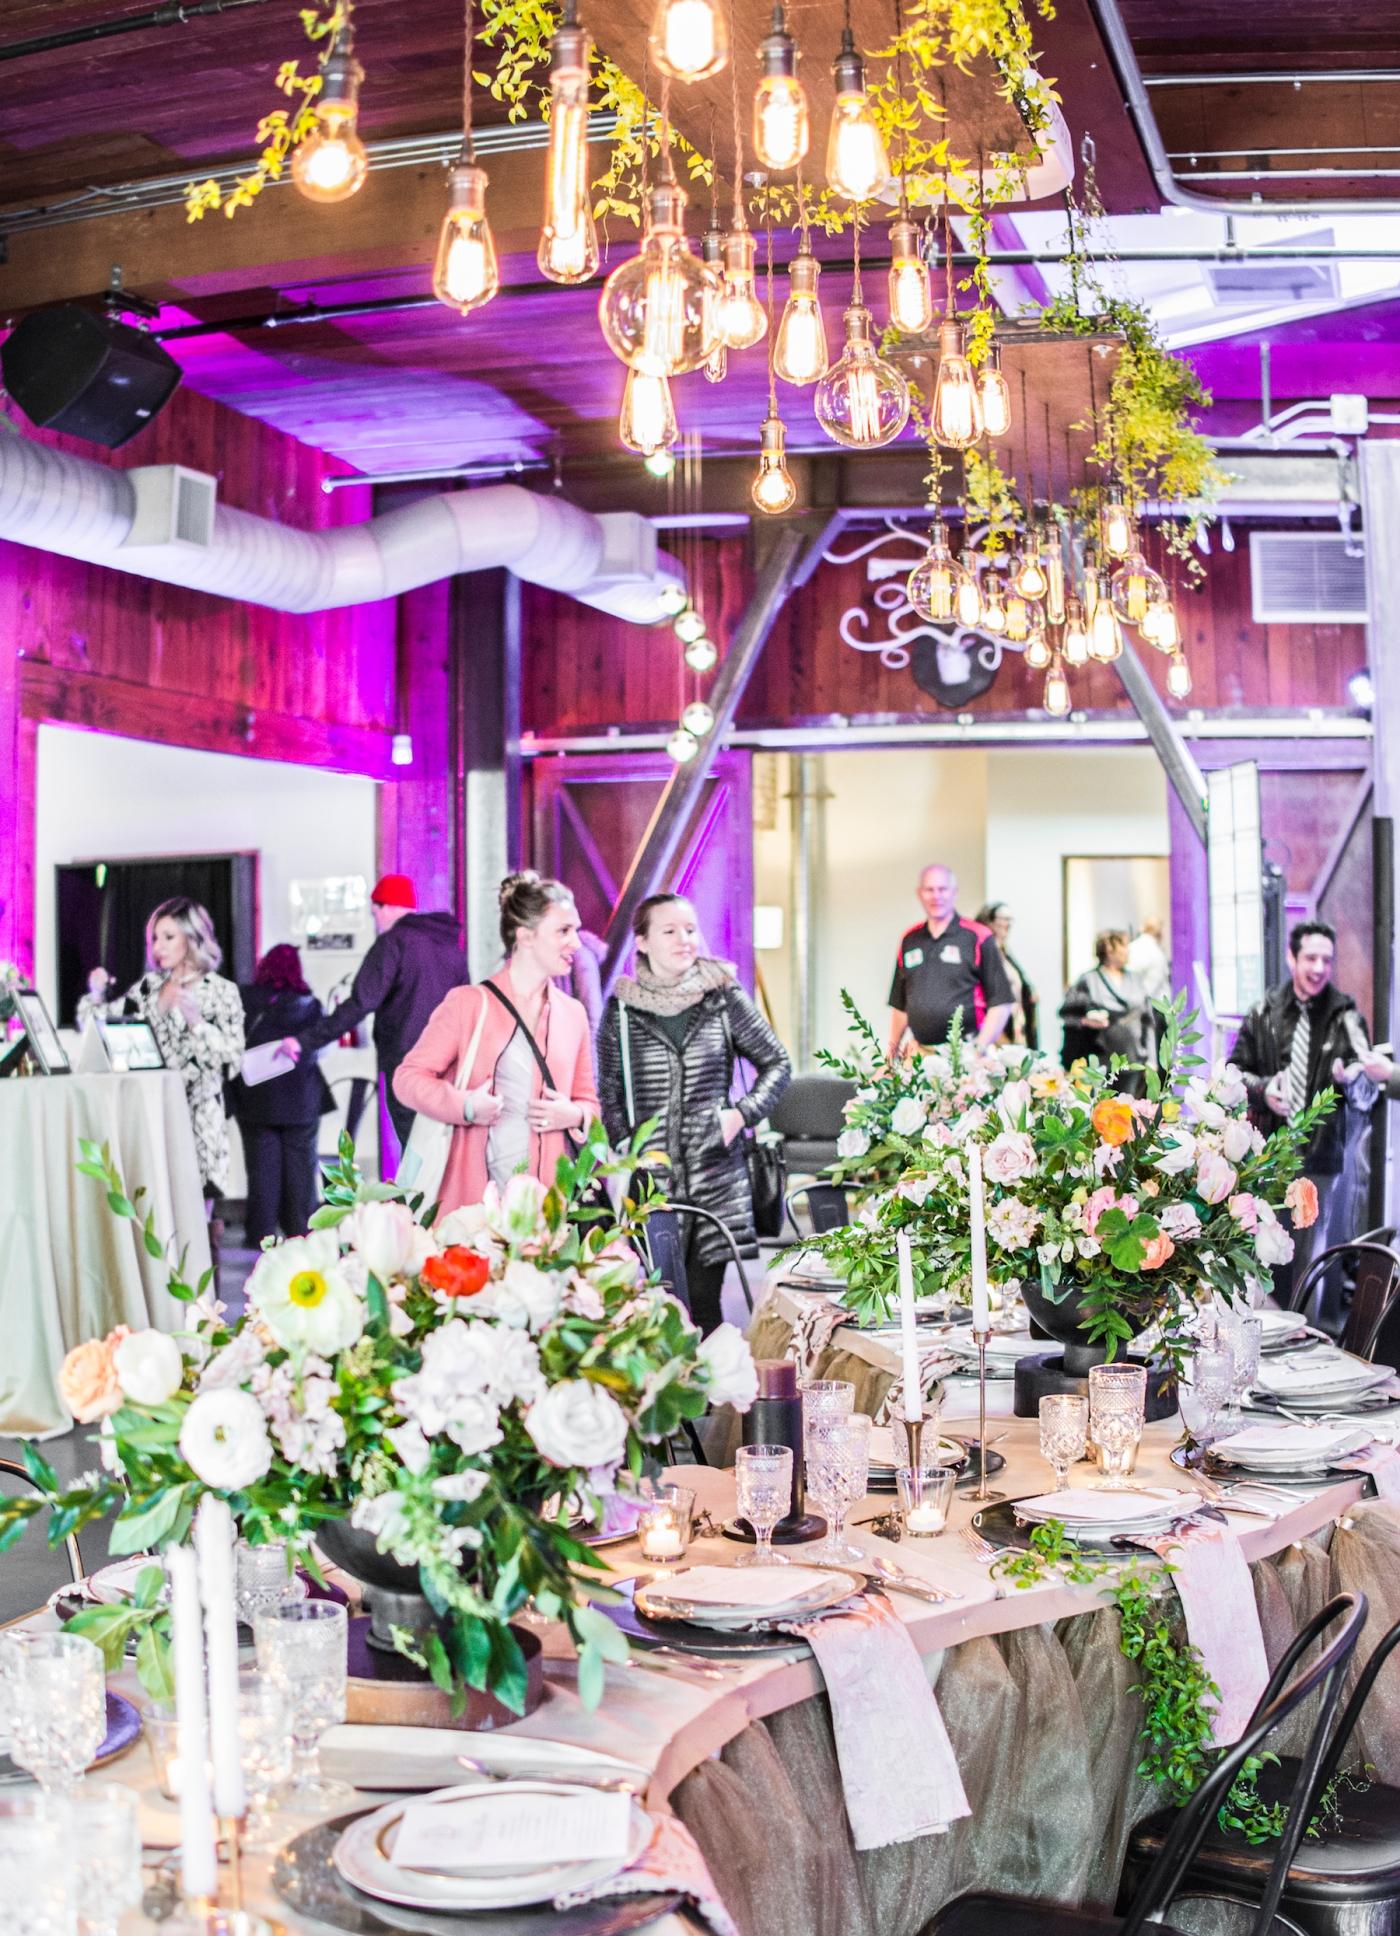 photography_by_jane_speleers_2017_wedding_show_i_do_sodo_within_designed_by_melody_davisdsc_0611